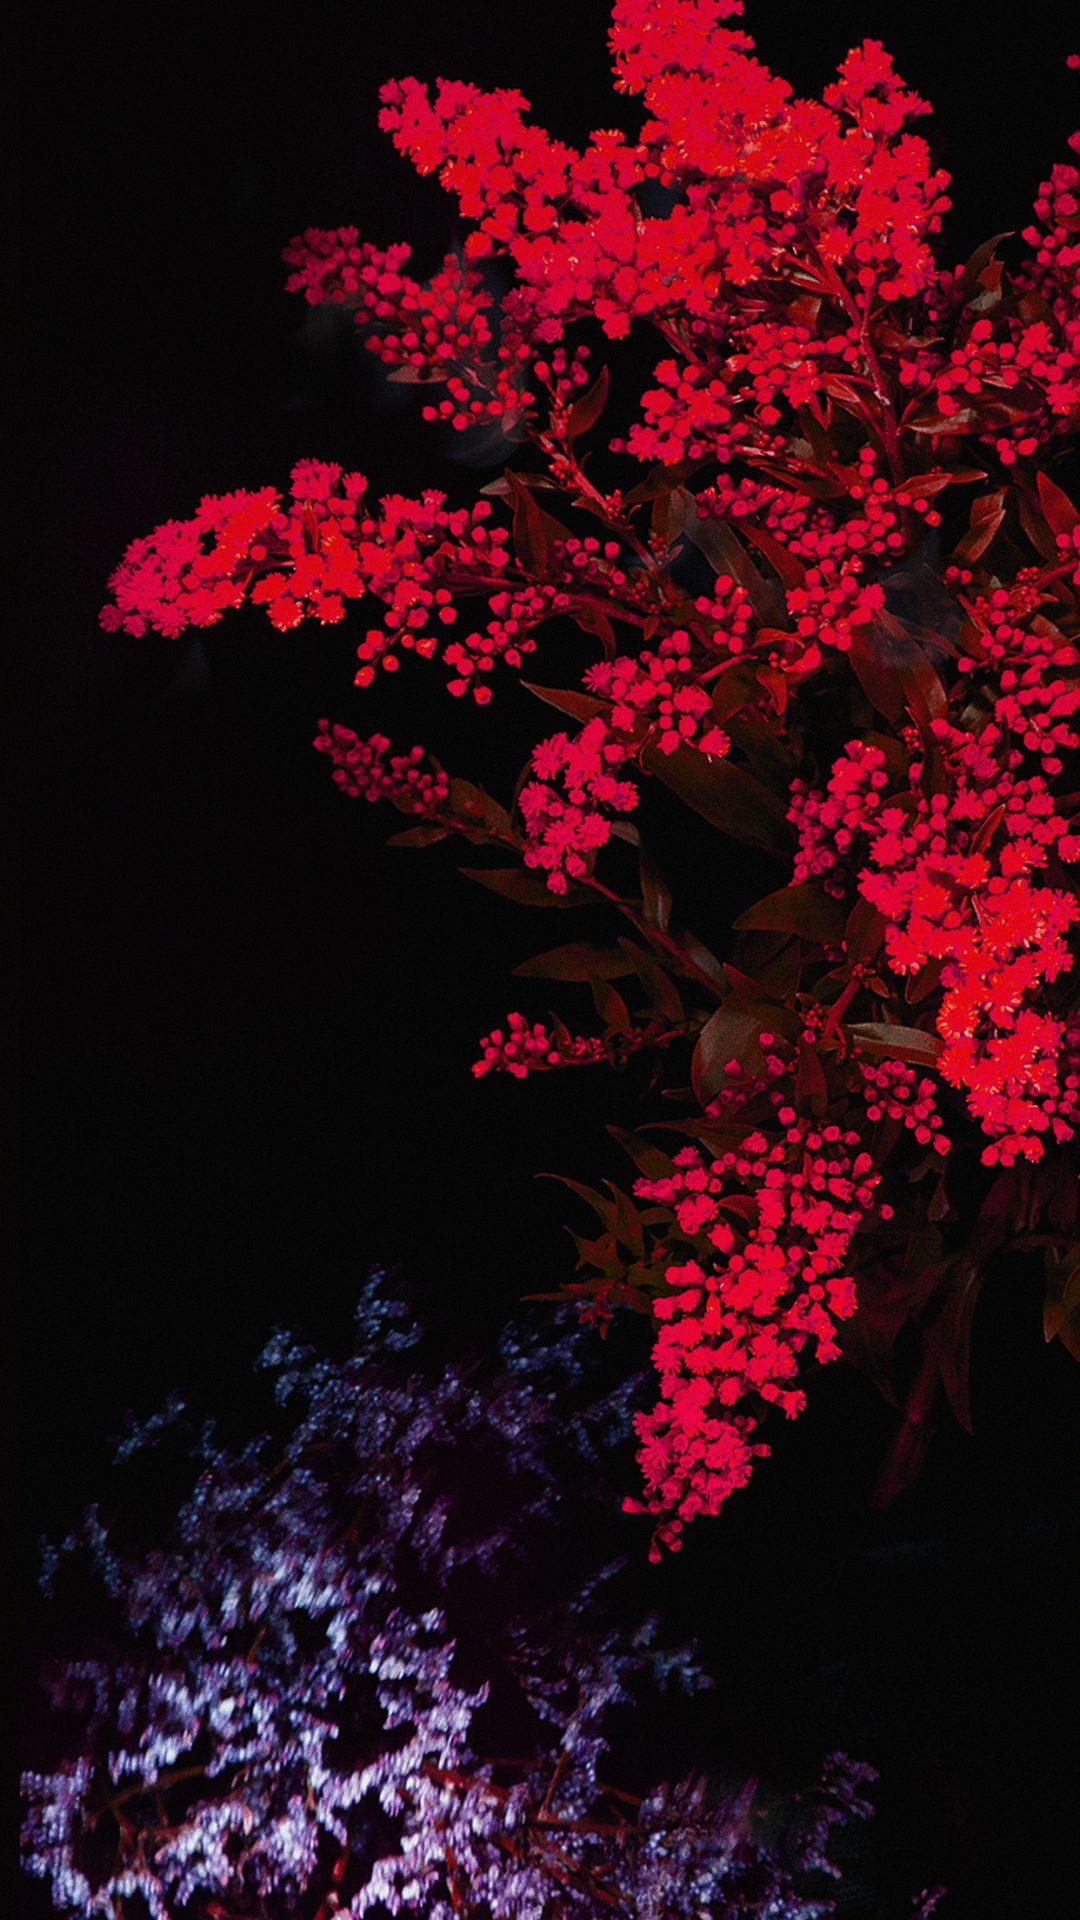 Apple Red Flower Dark Ios9 Iphone6s